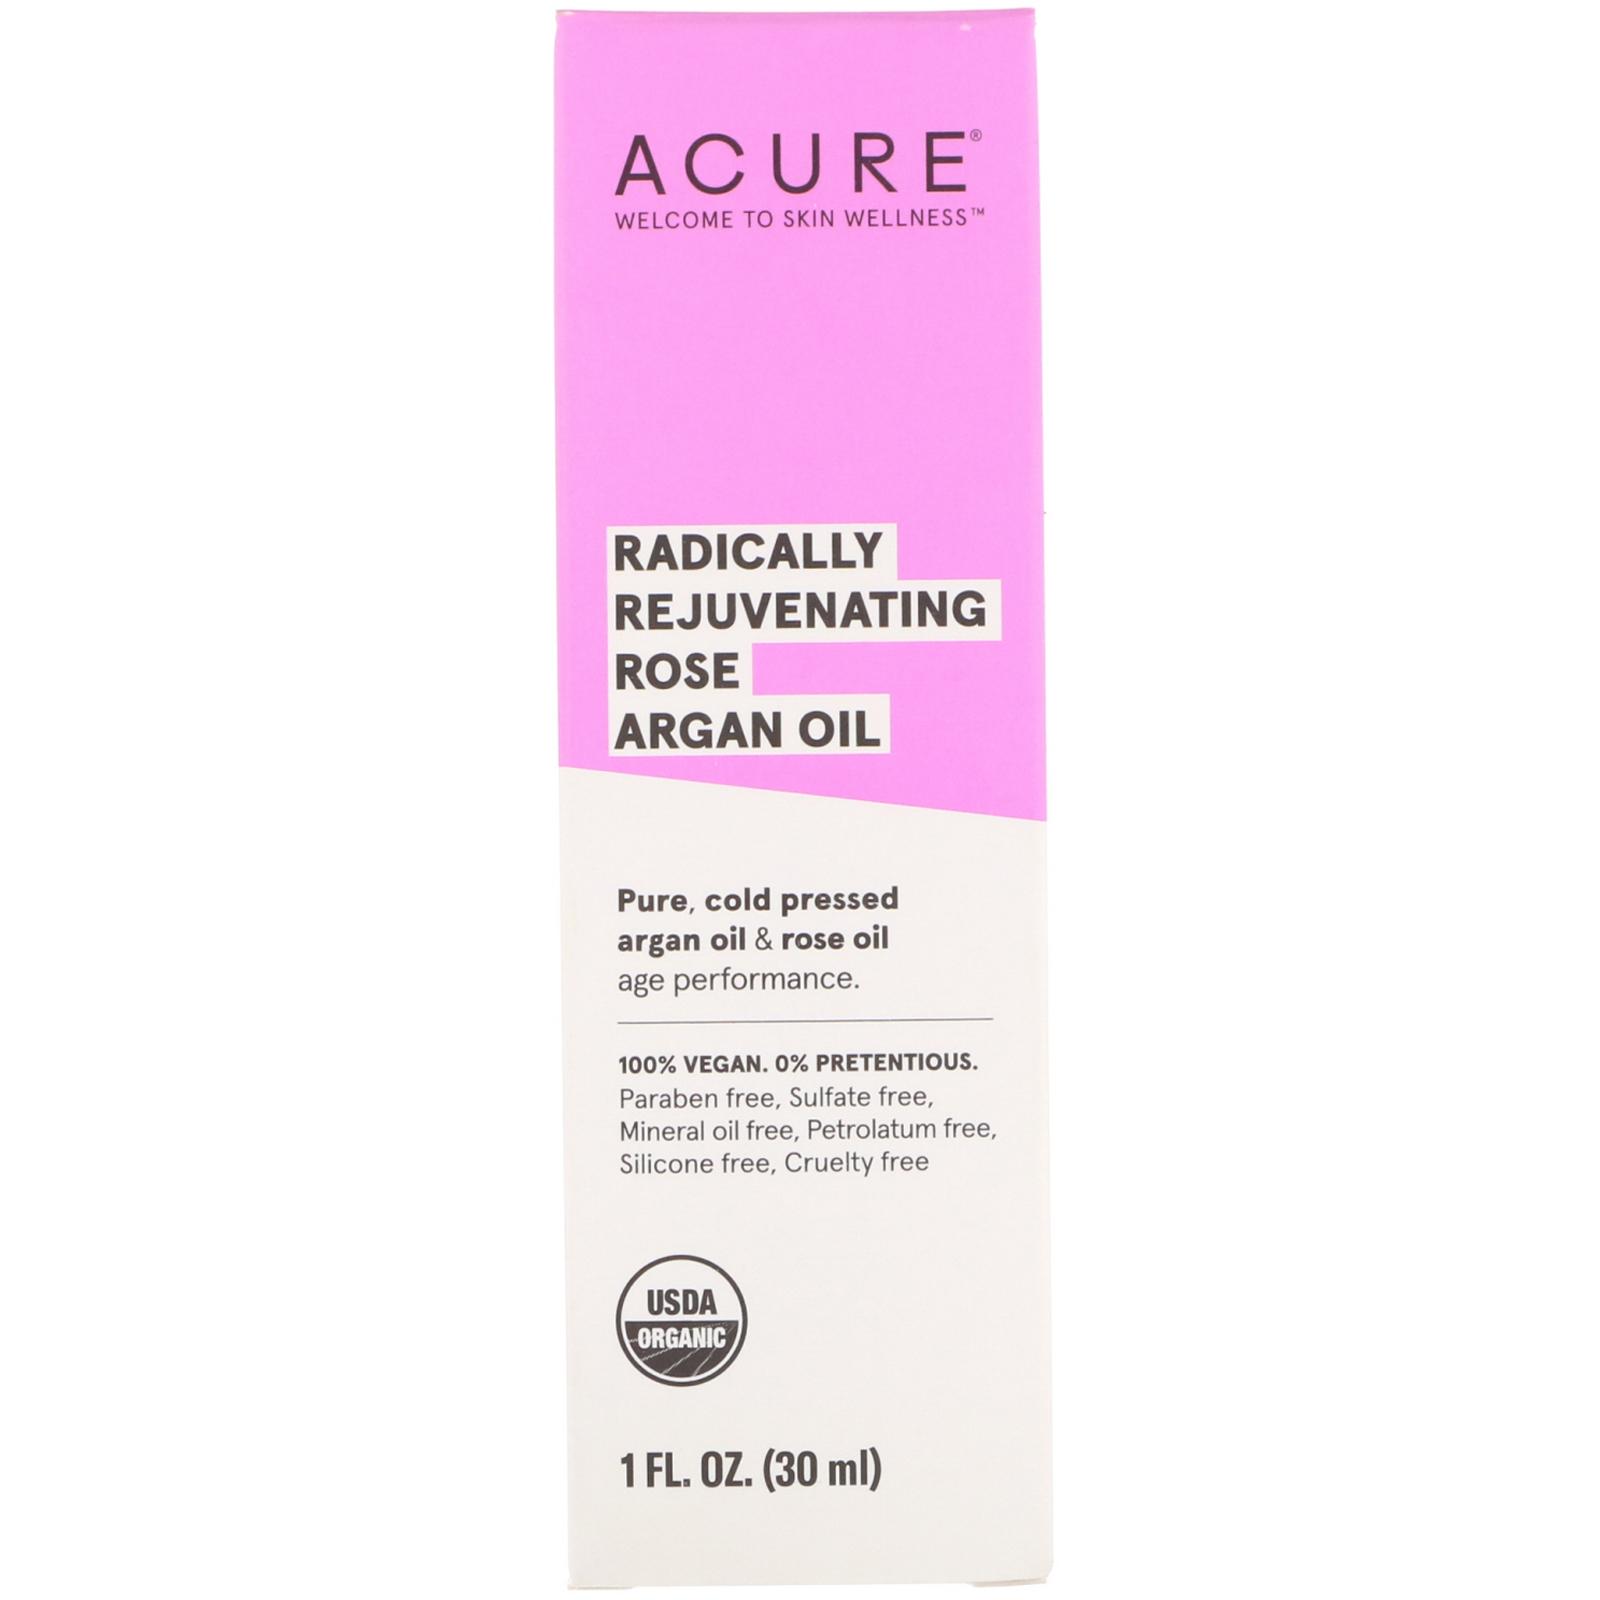 Acure, Radically Rejuvenating Rose Argan Oil, 1 Fl Oz (30